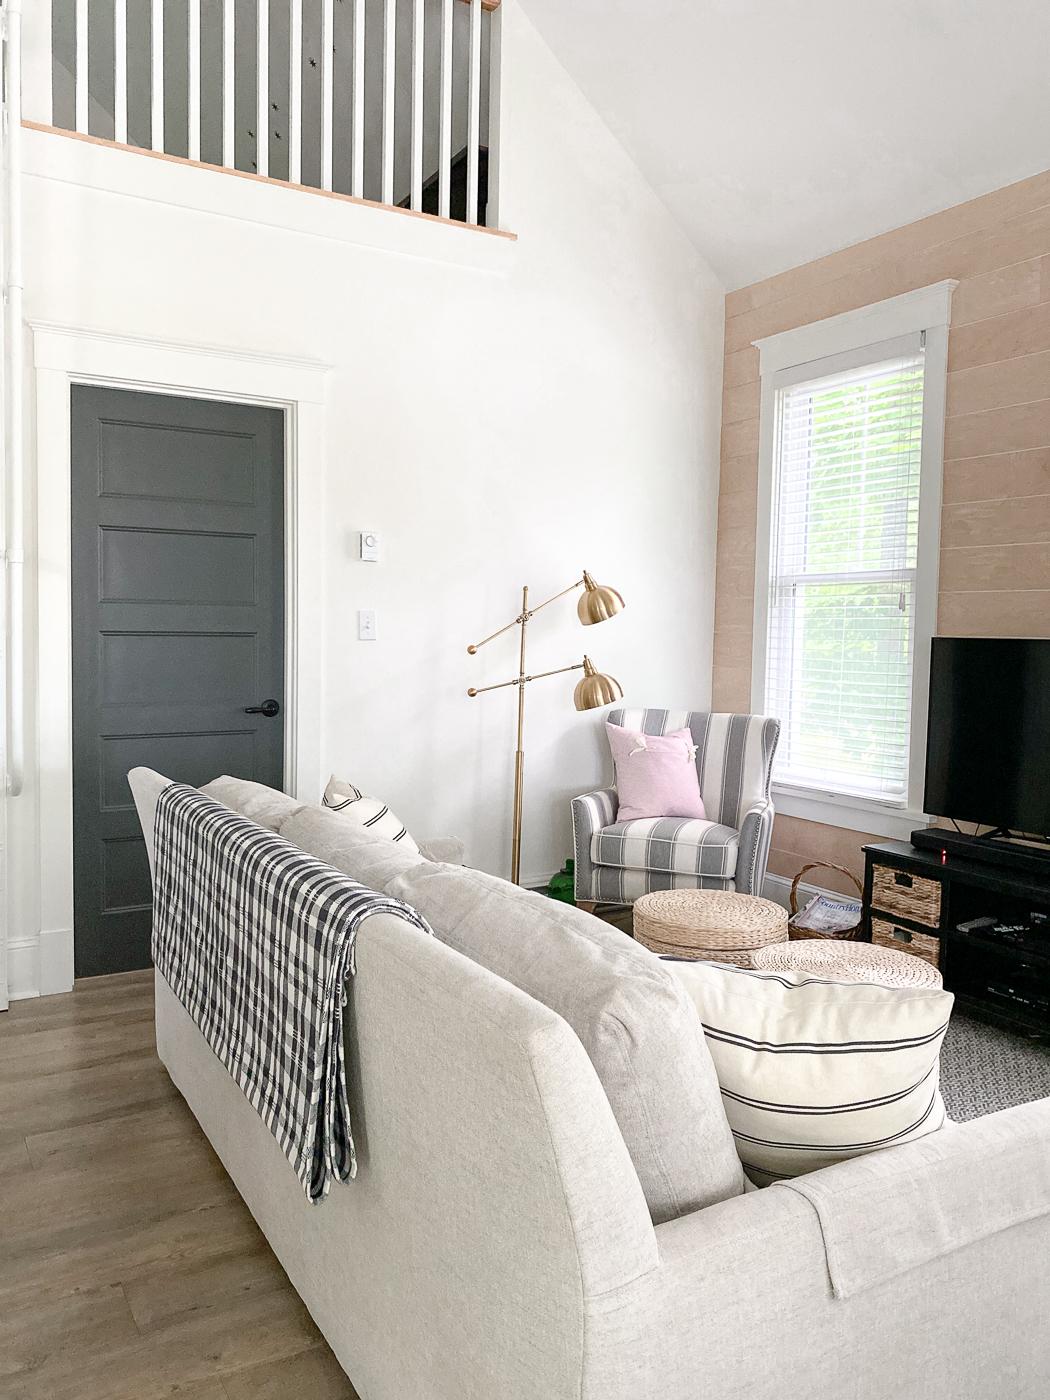 summer cottage decorating ideas, summer cottage decor, cottage decorating ideas living room